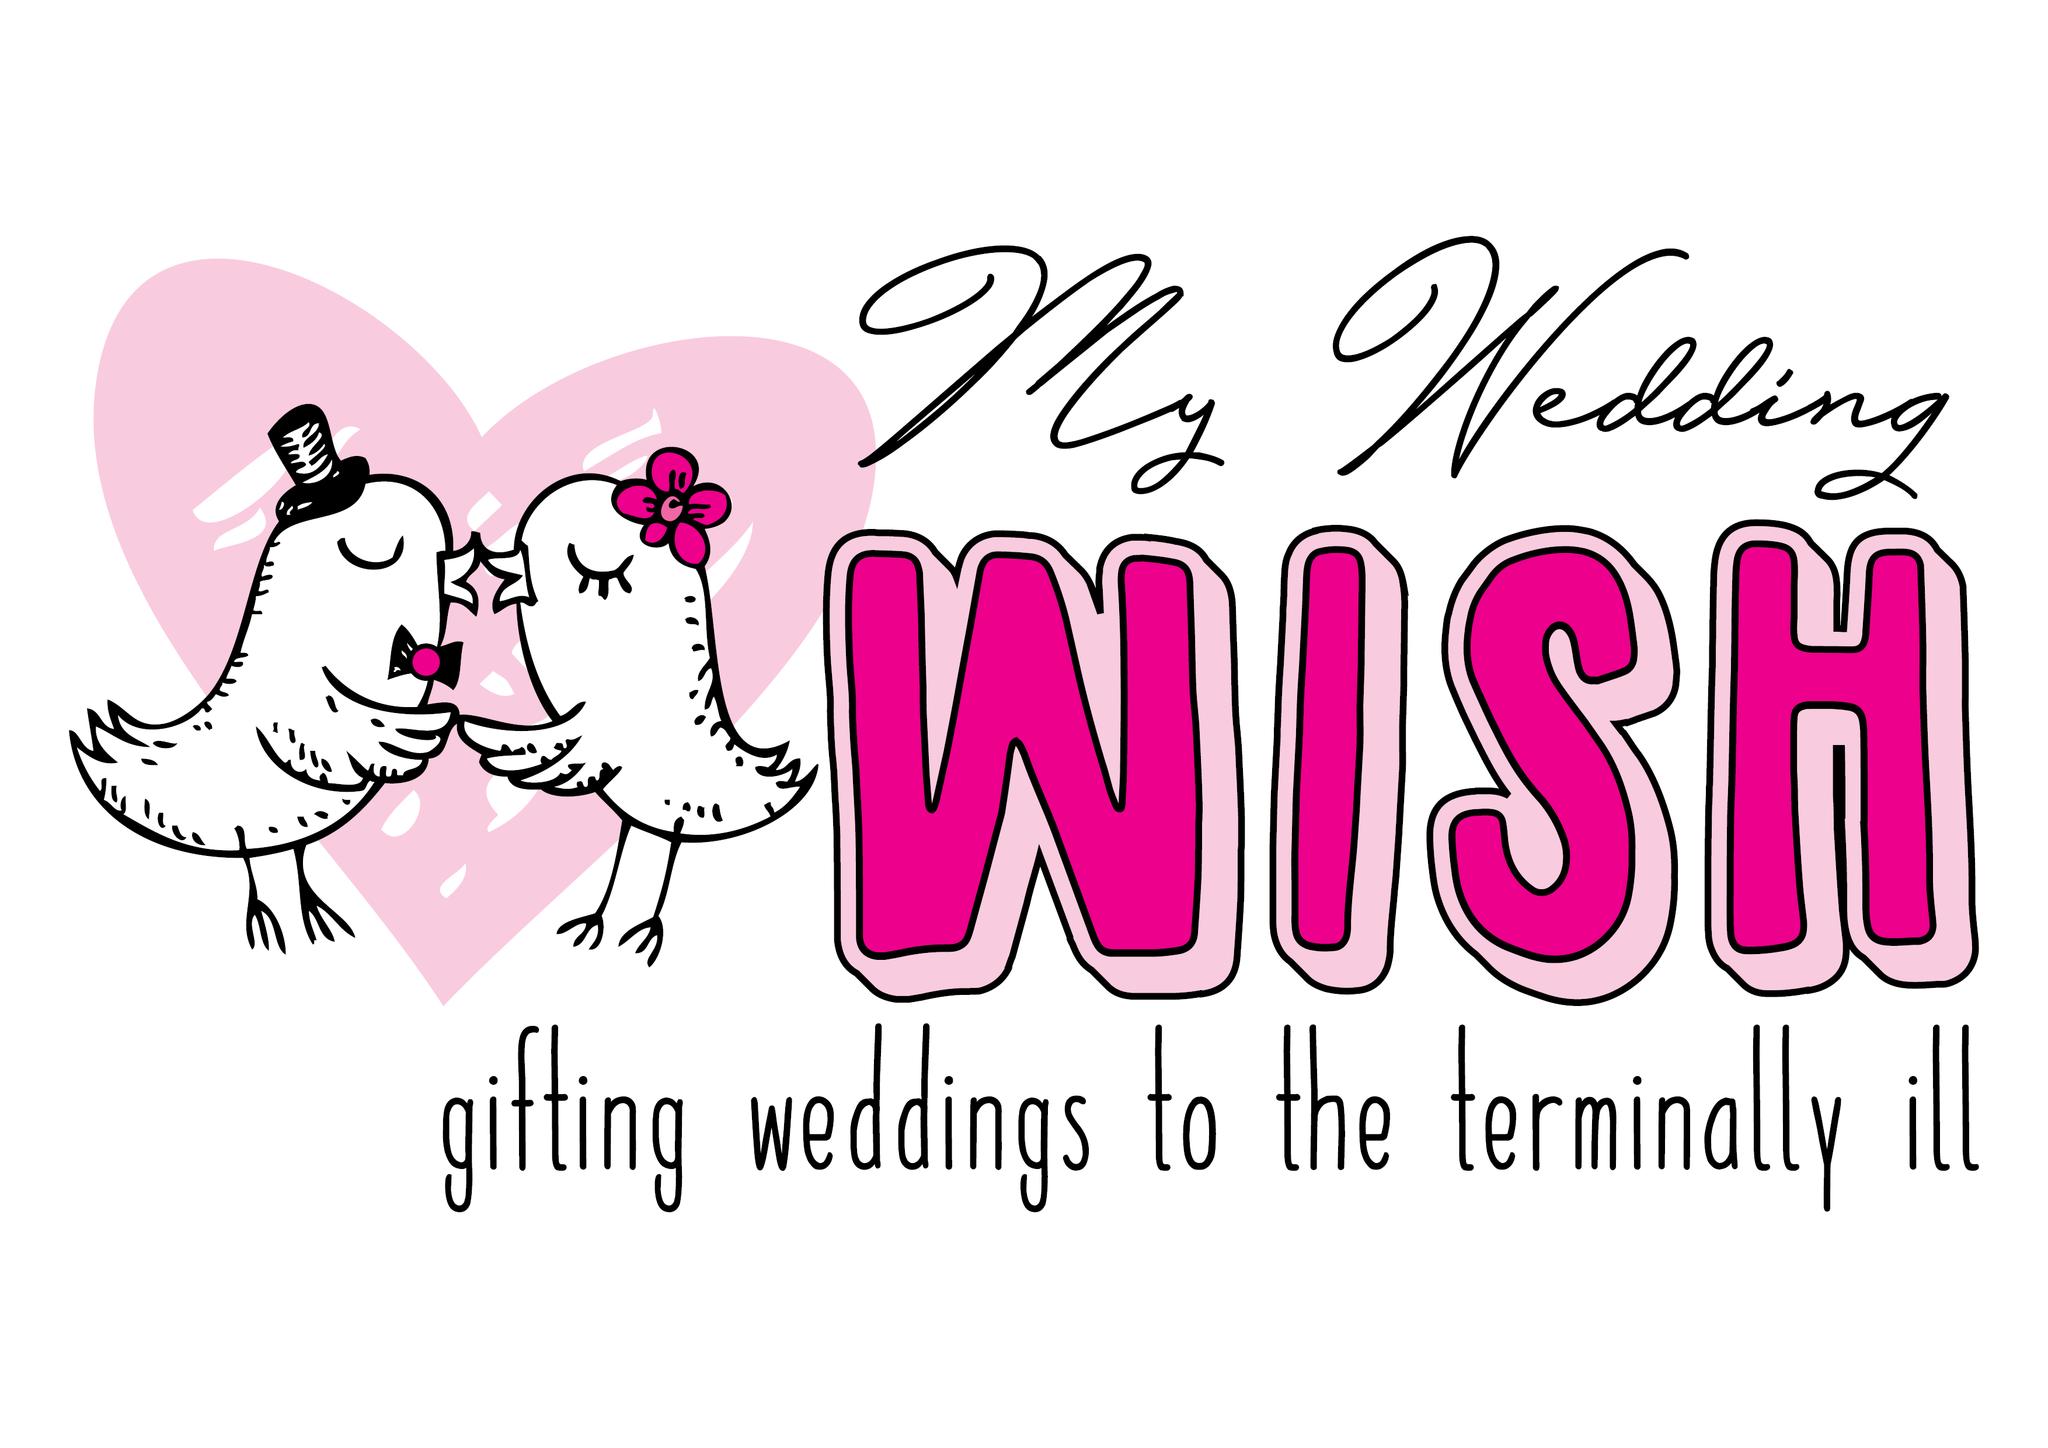 My Wedding Wish